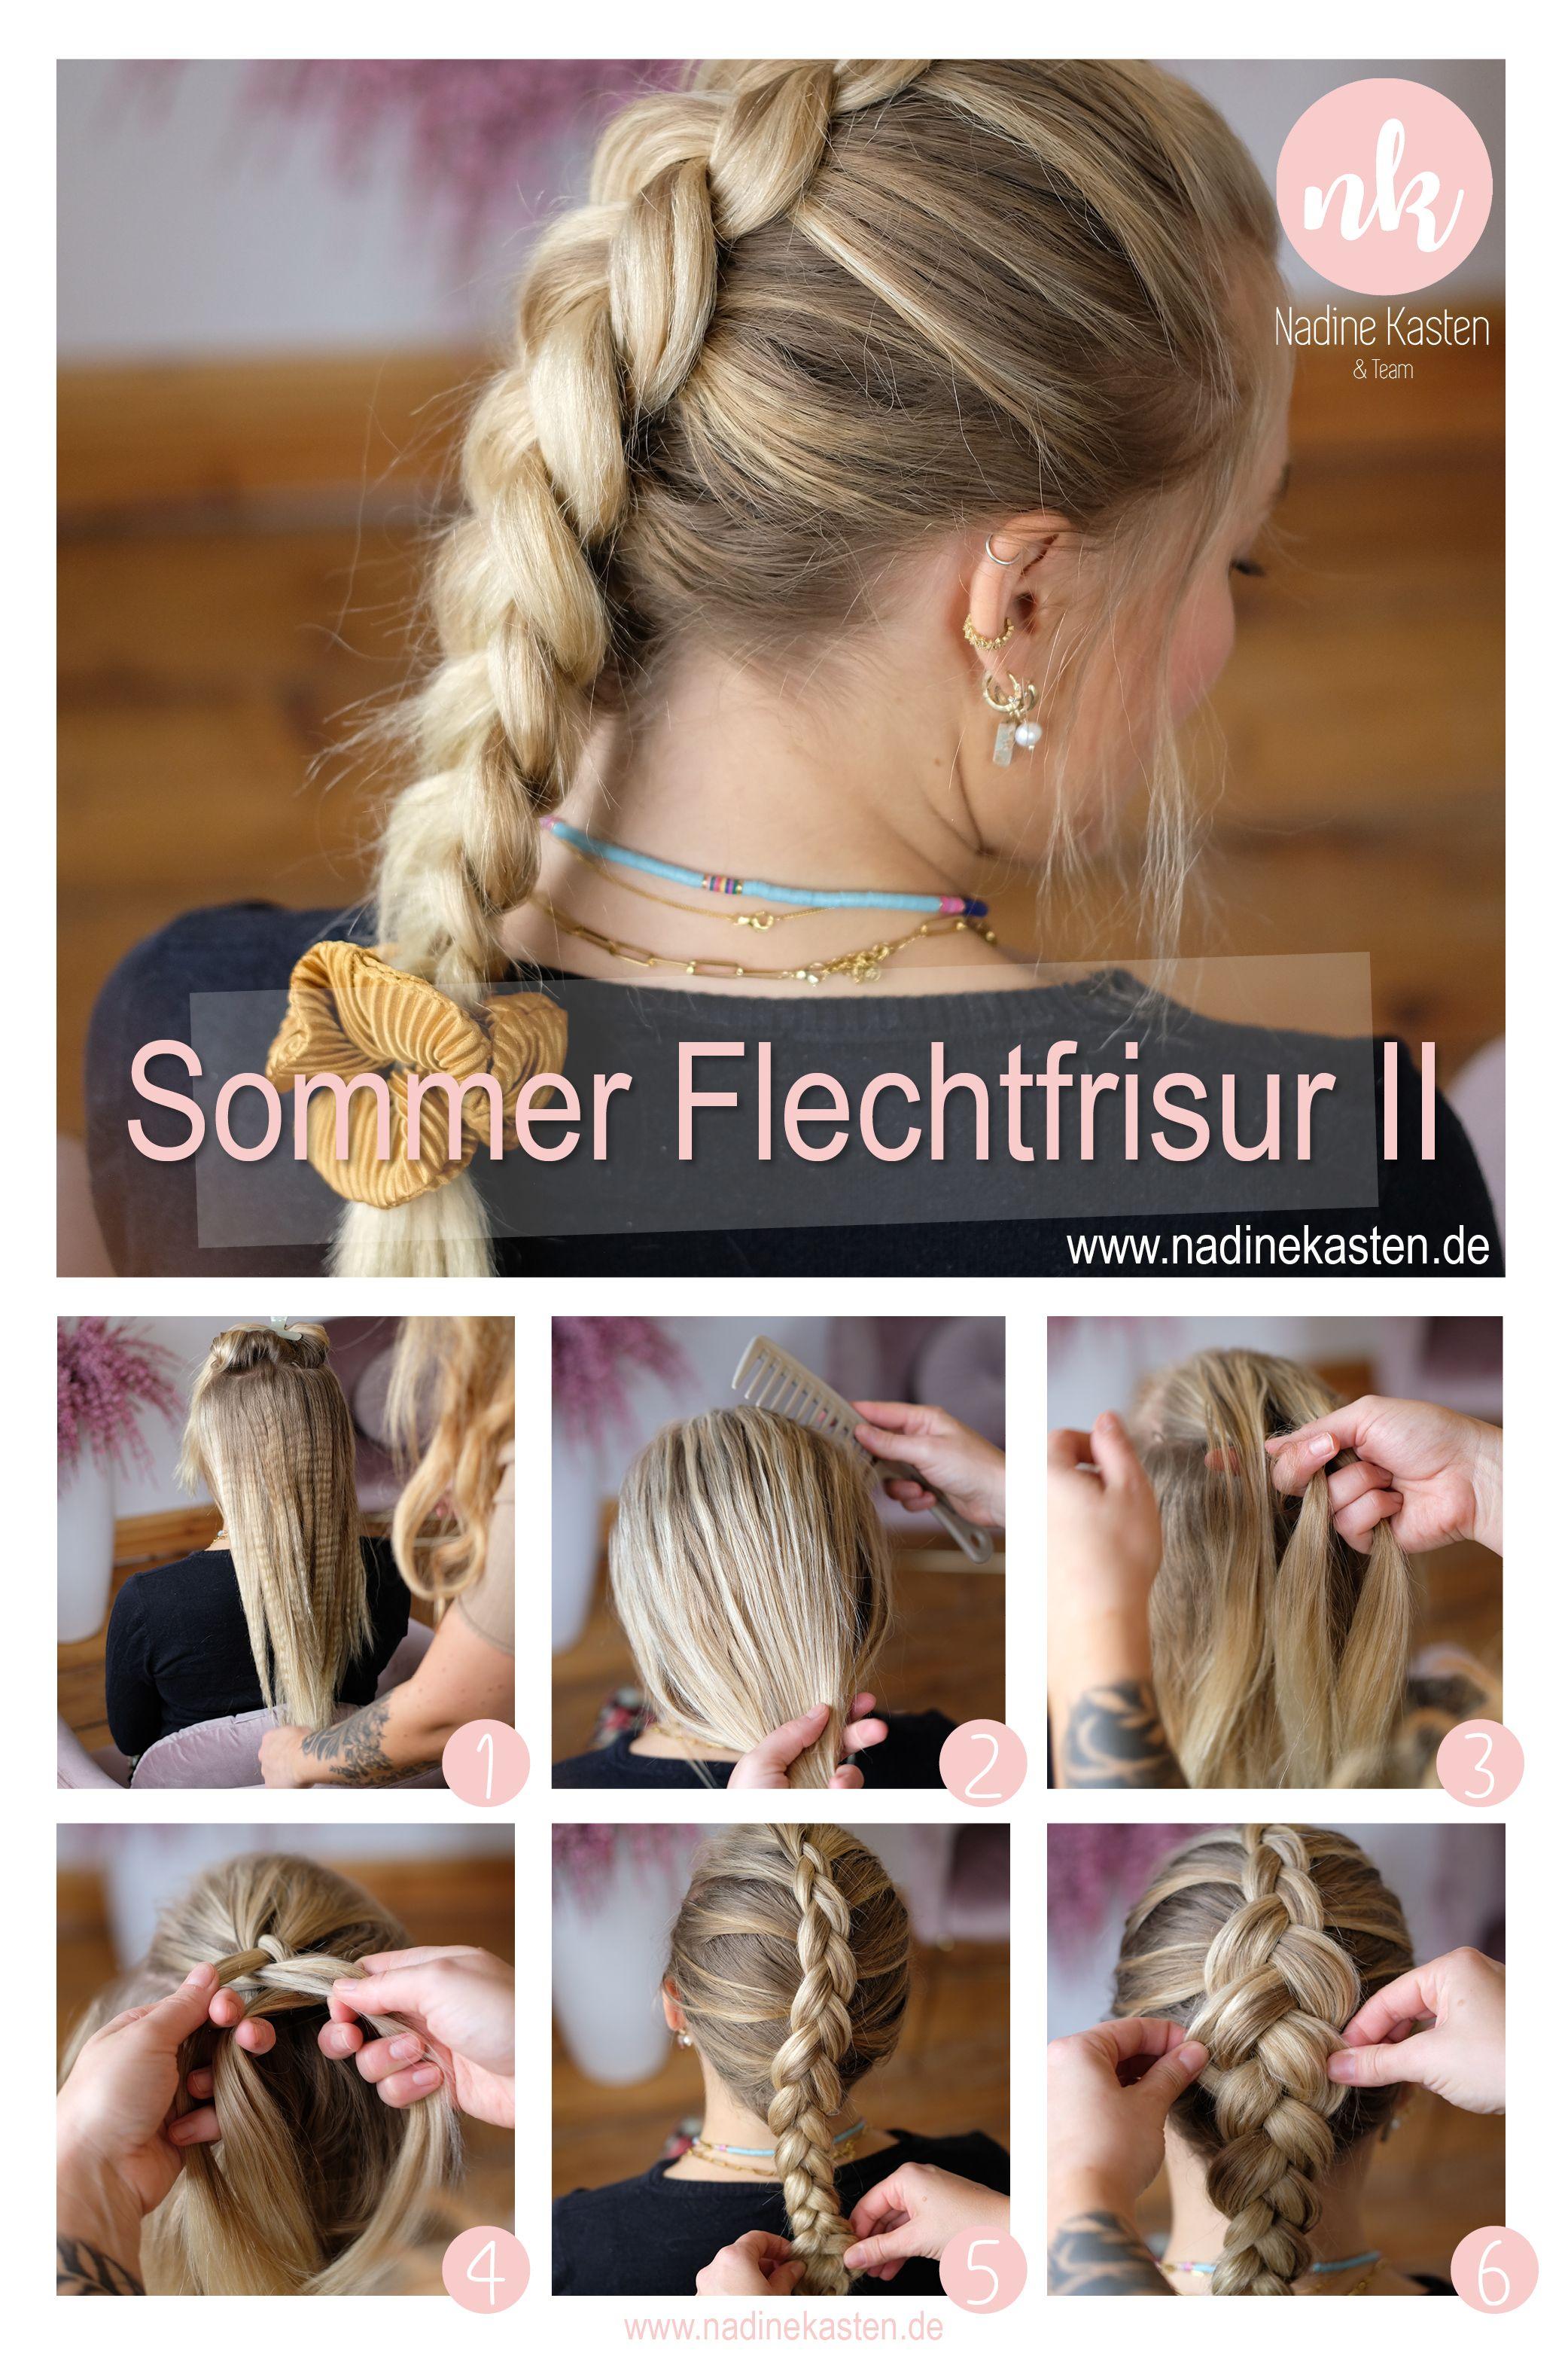 Diy Sommer Flechtfrisur 2 Step By Step Geflochtene Frisuren Flechtfrisuren Haar Styling